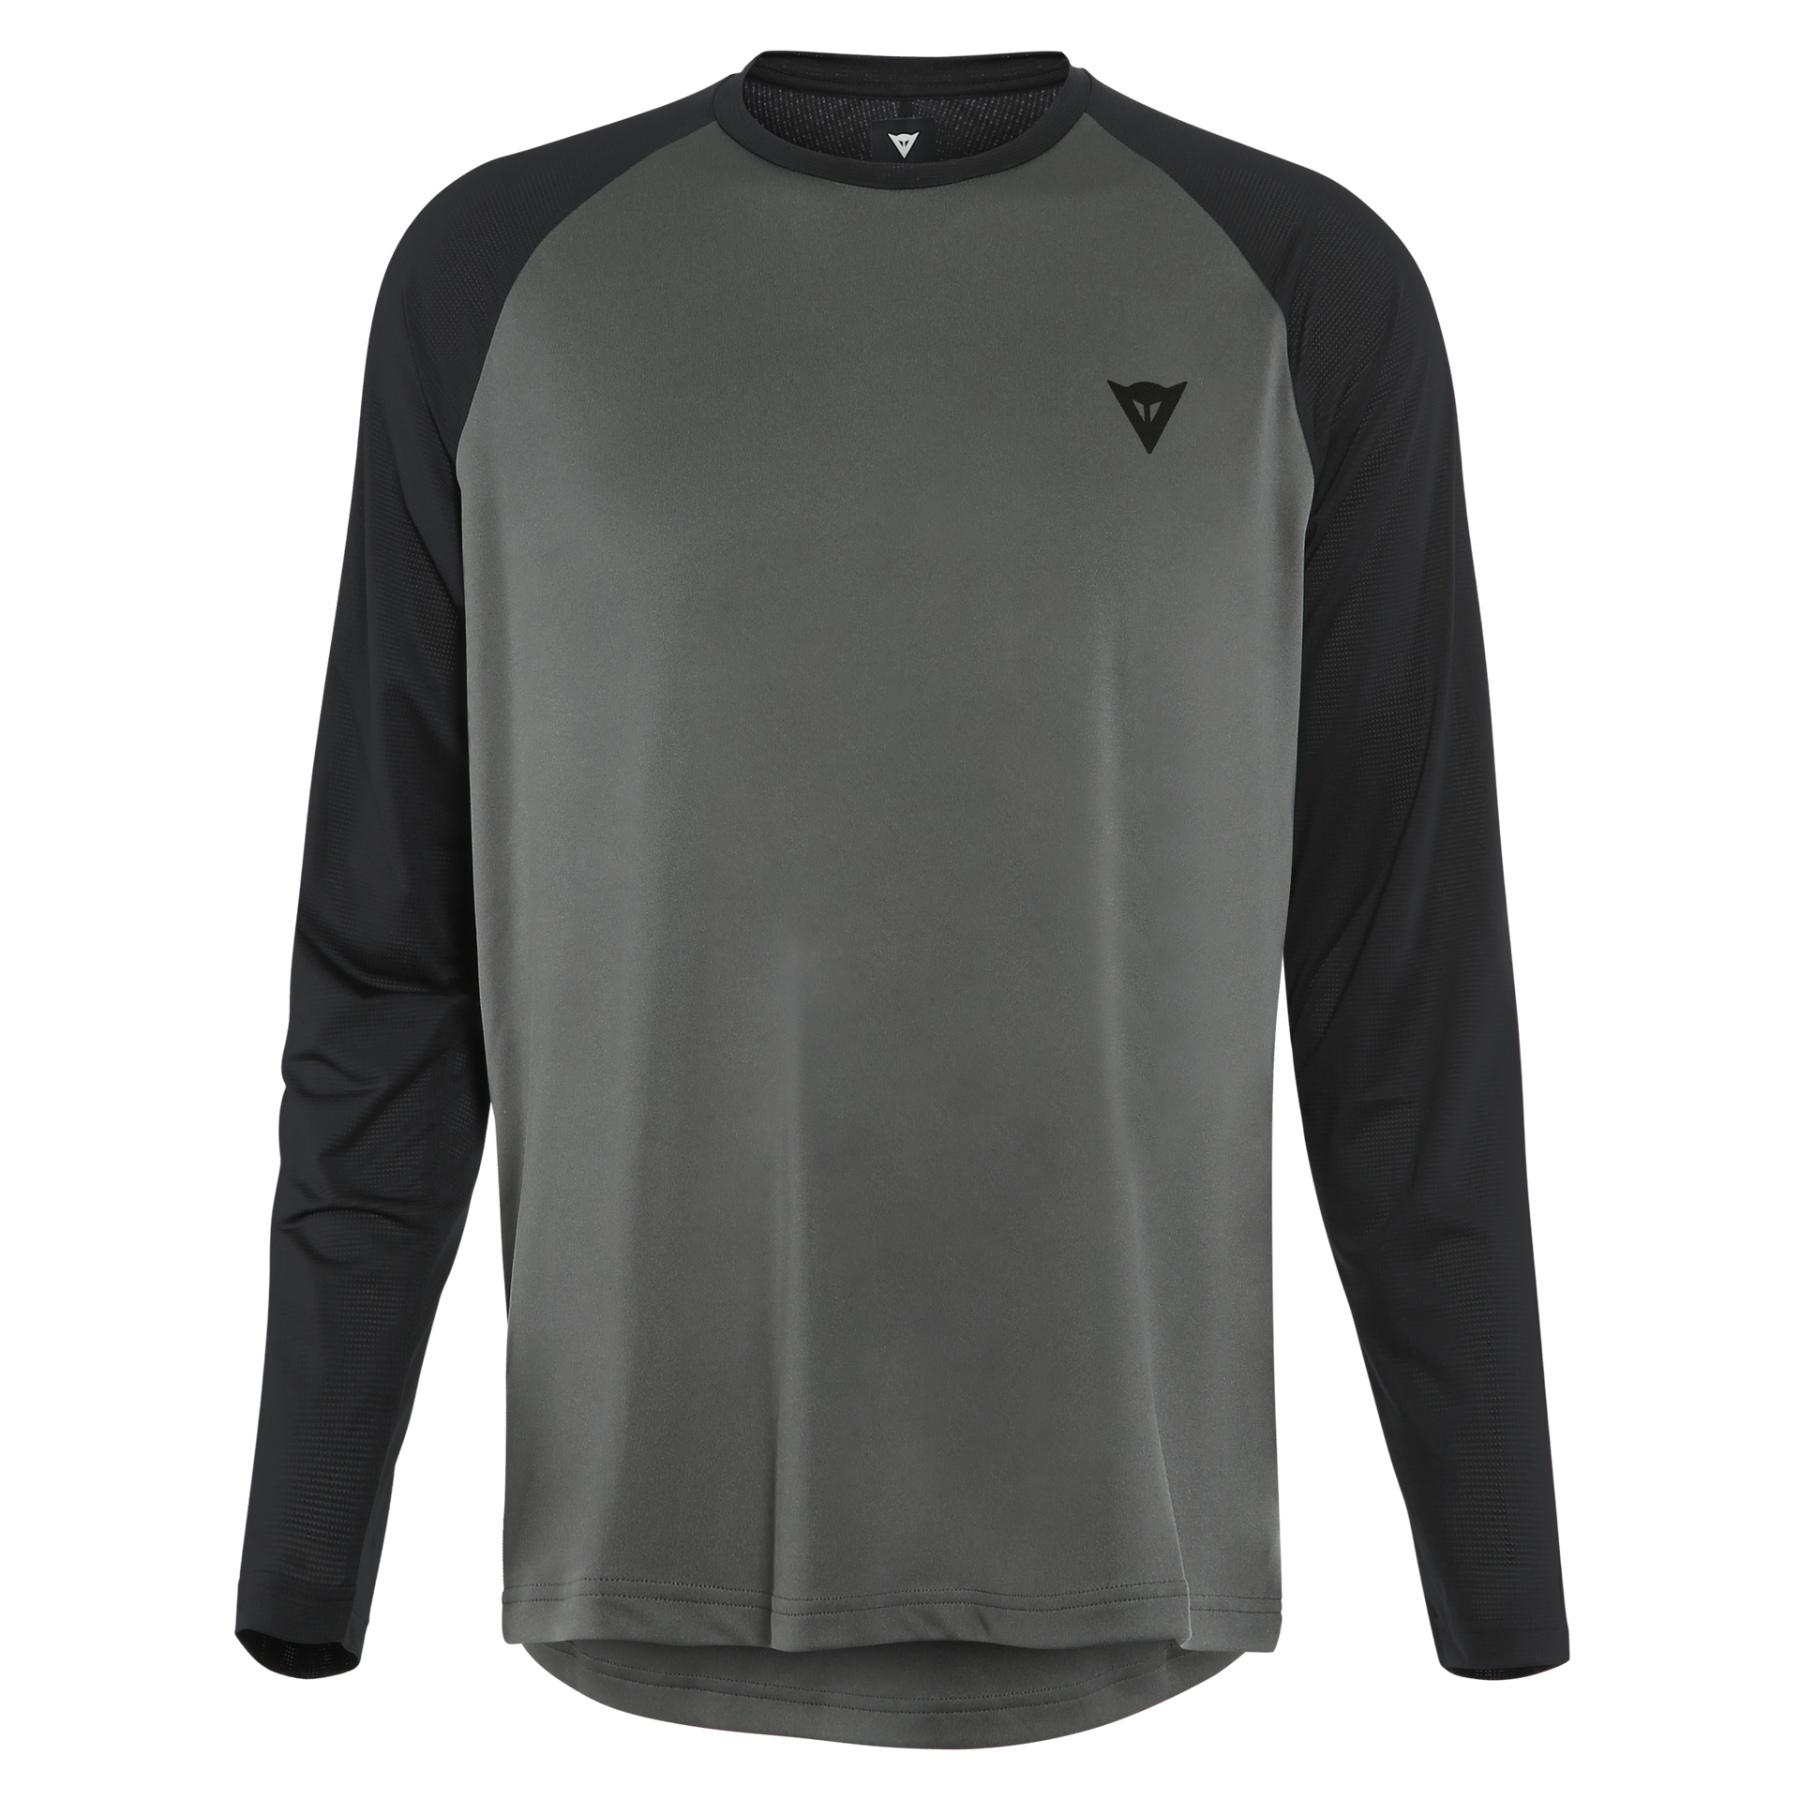 Picture of Dainese HG Tsingy MTB Longsleeve Jersey - dark-gray/black